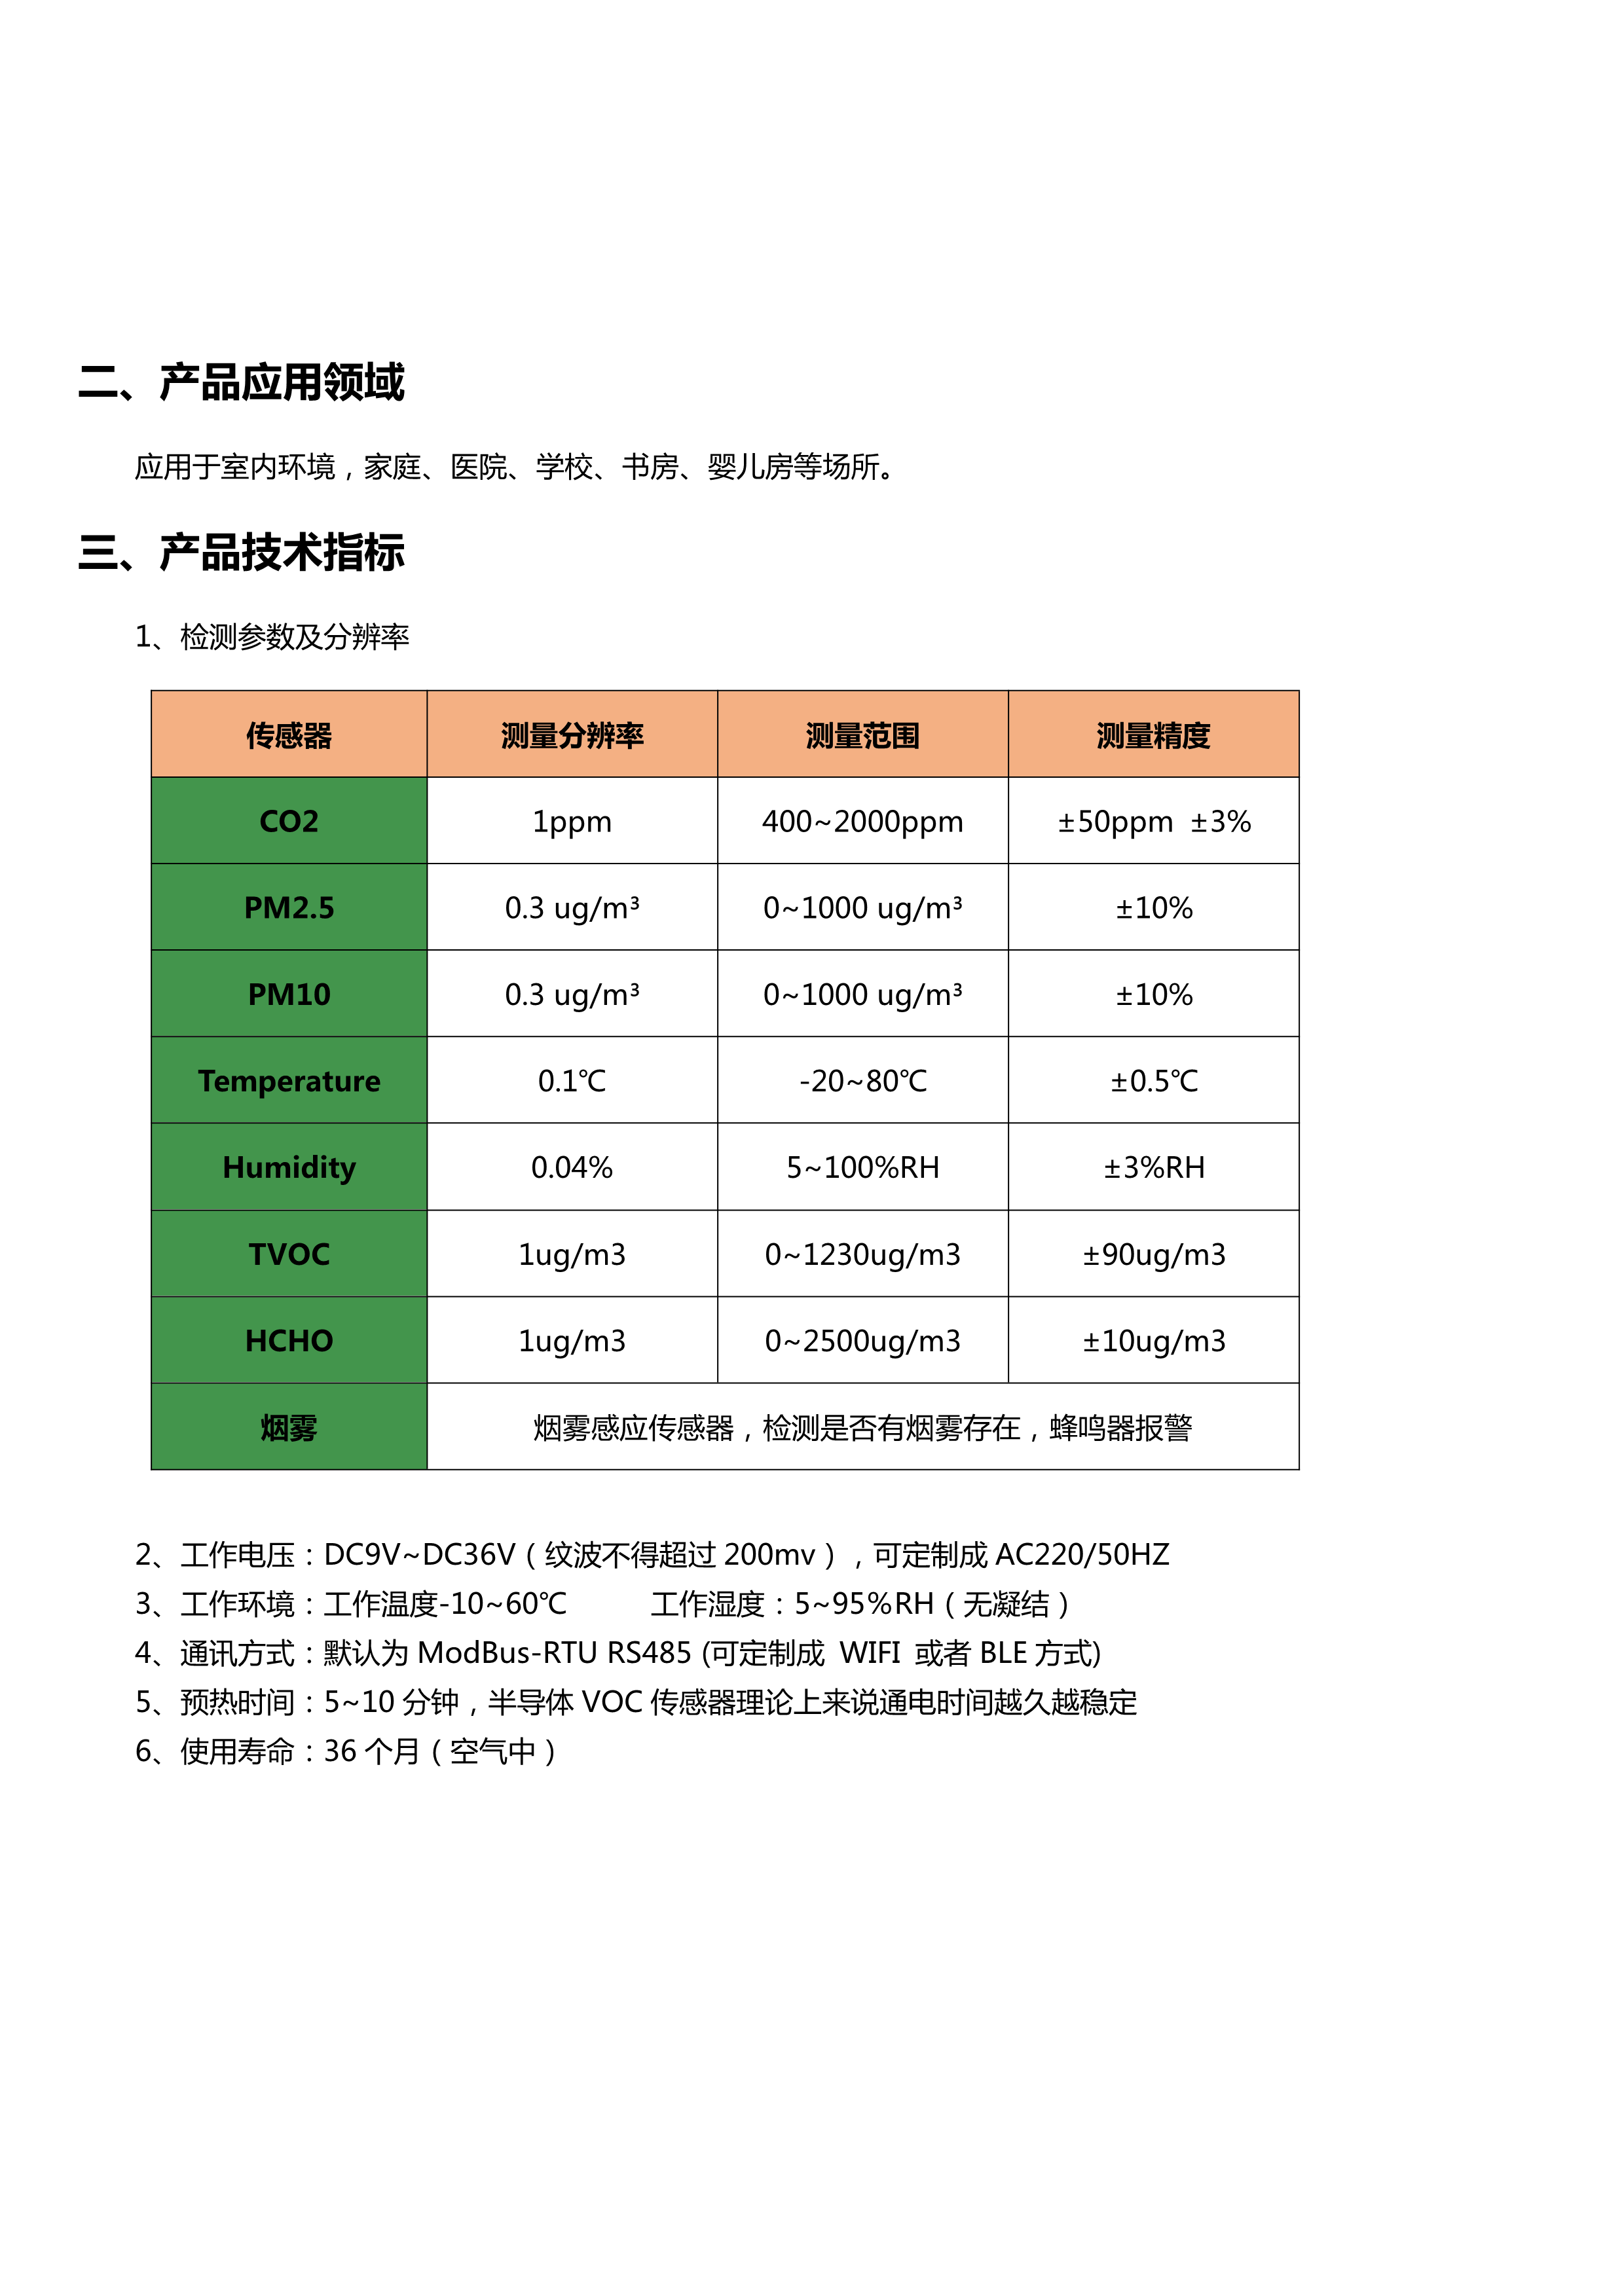 CRK-X6吸頂式環境監測設備說明書V1.0_4.png